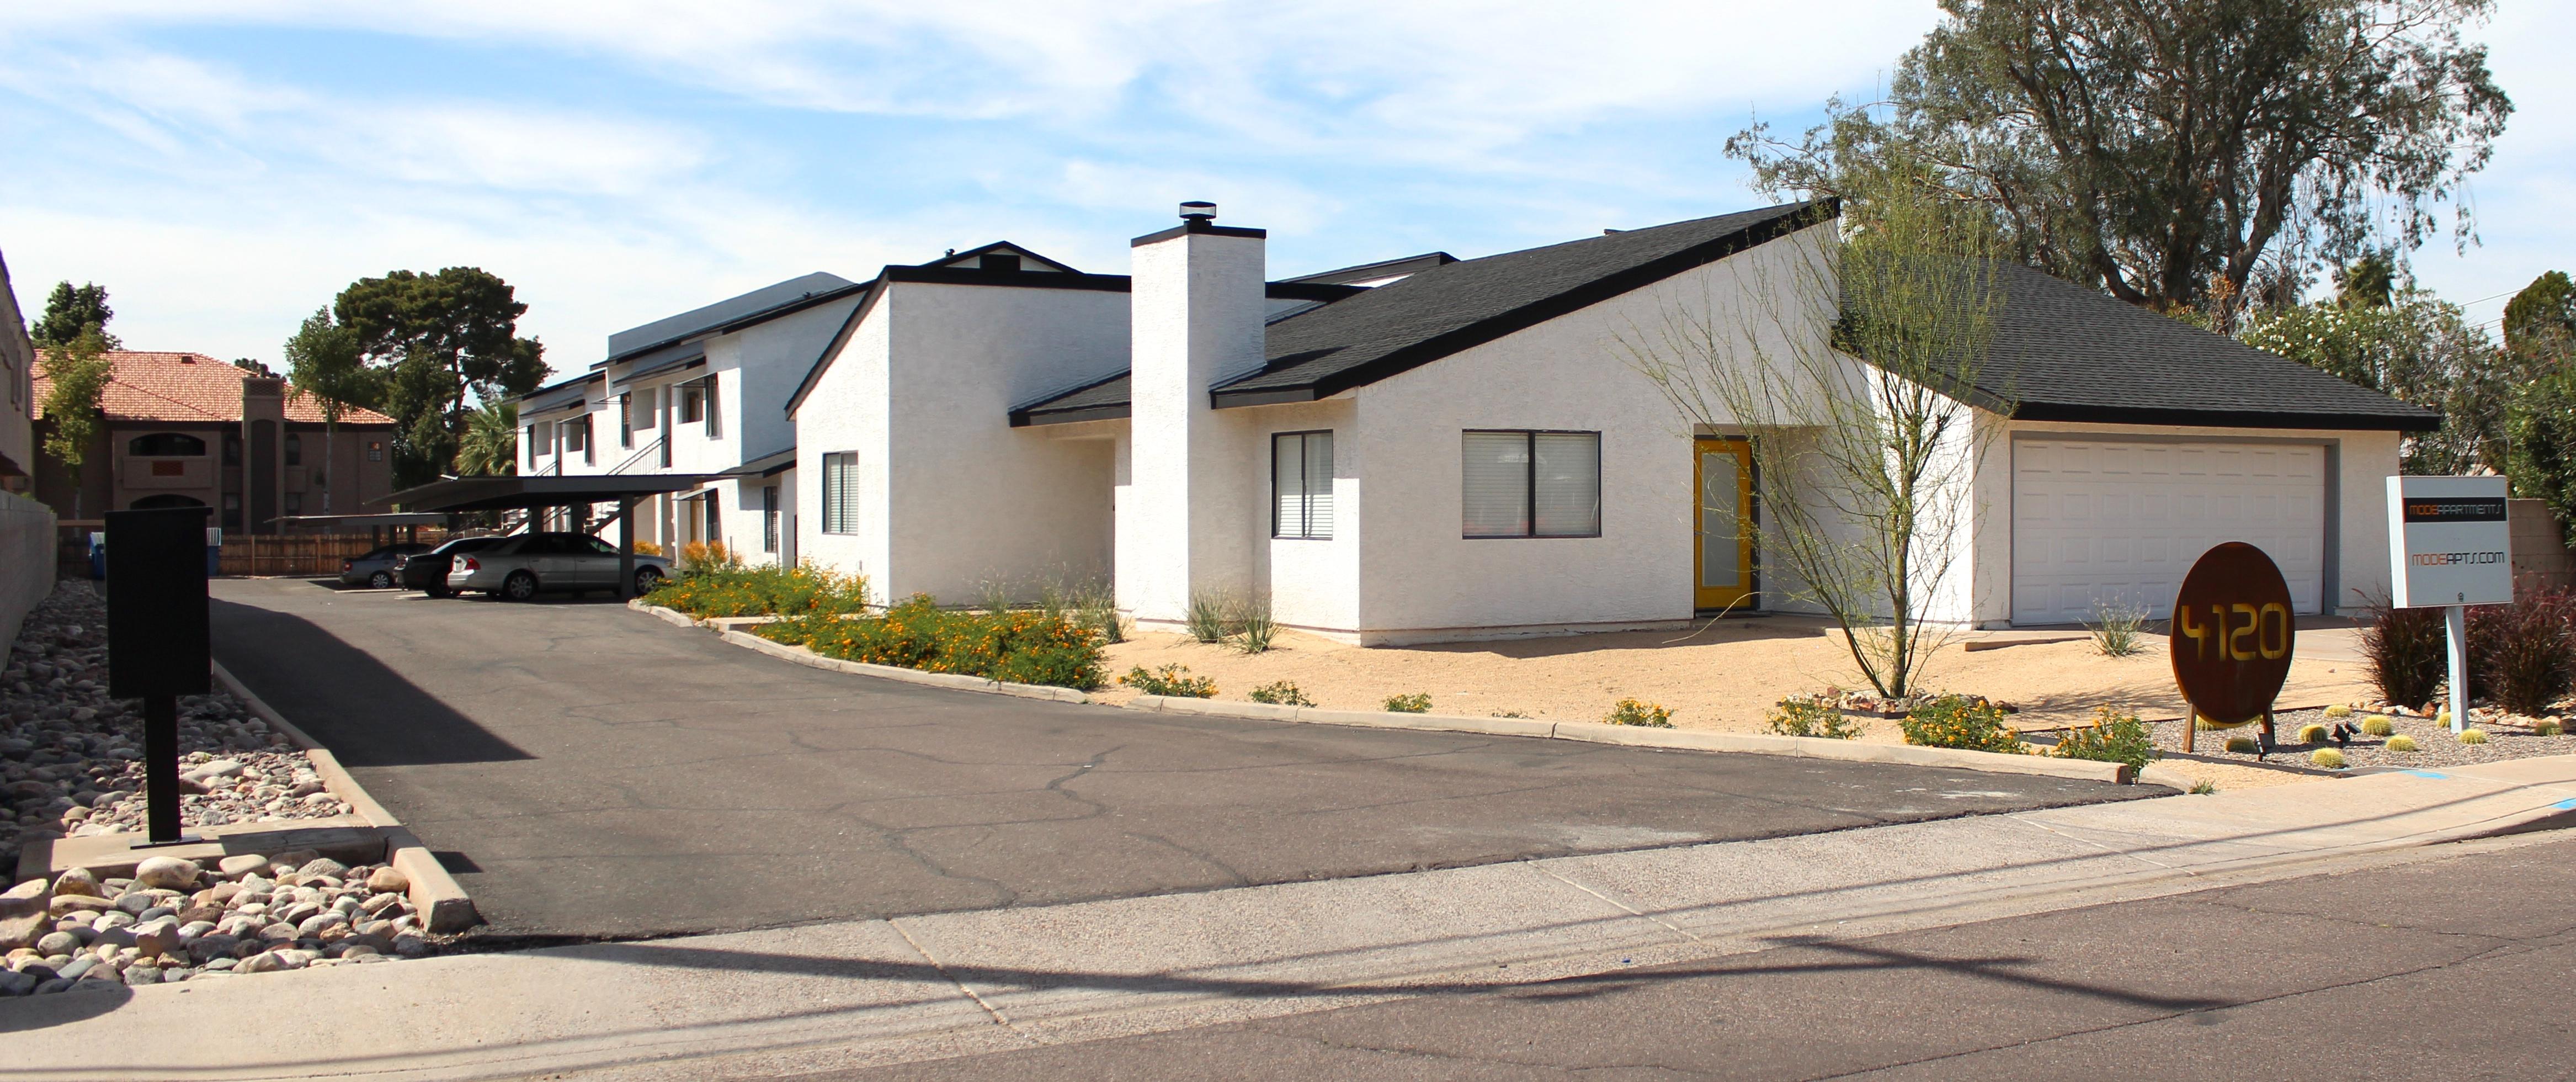 MODE Biltmore @ 22nd Street | 4120 N 22nd St, Phoenix, AZ 85016